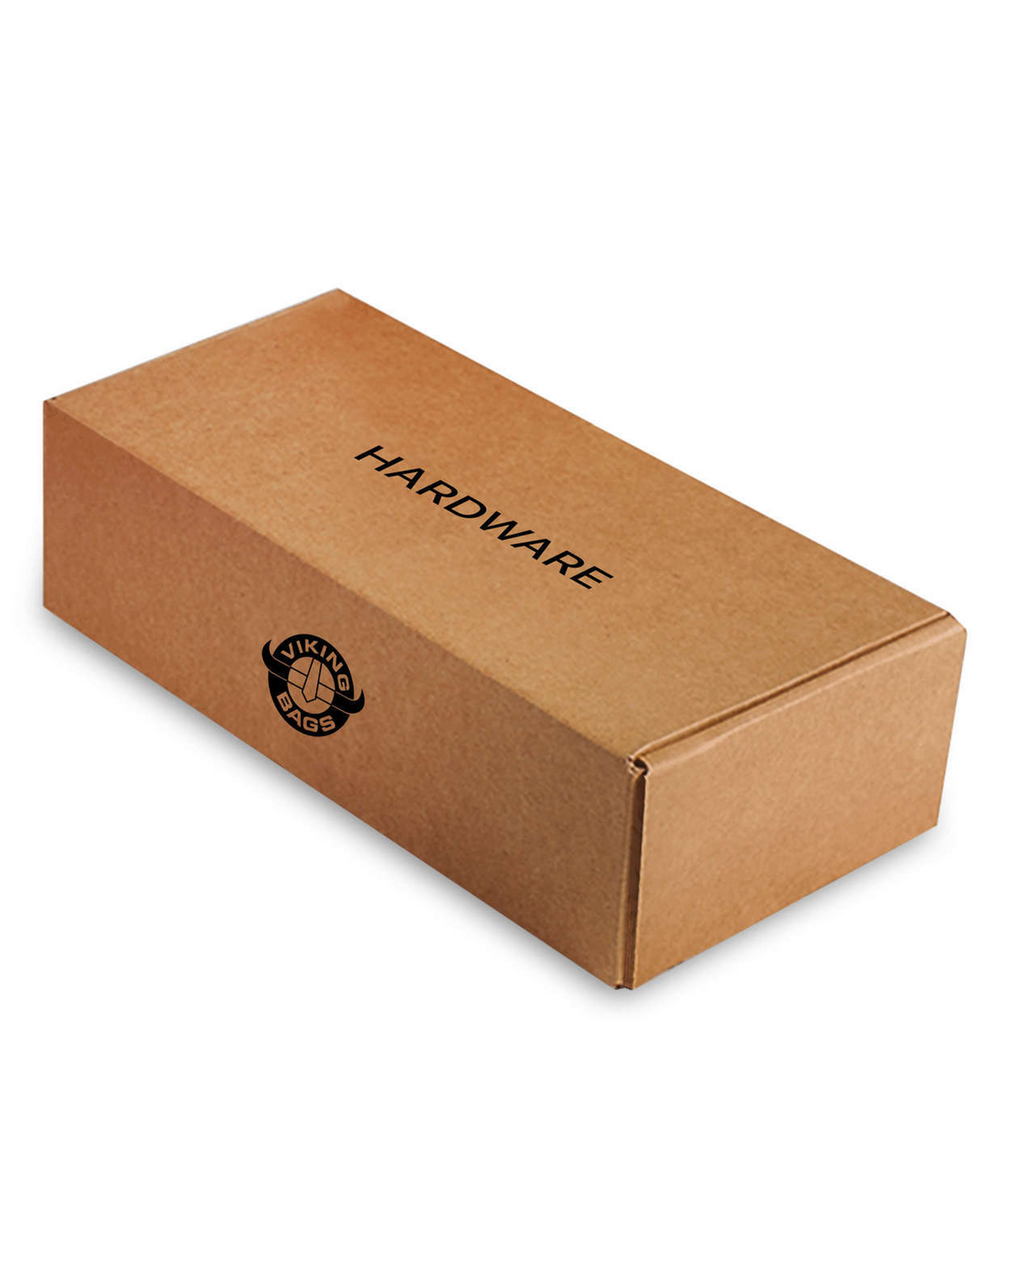 Indian Scout Charger Single Strap Large Motorcycle Saddlebags Hardware Box